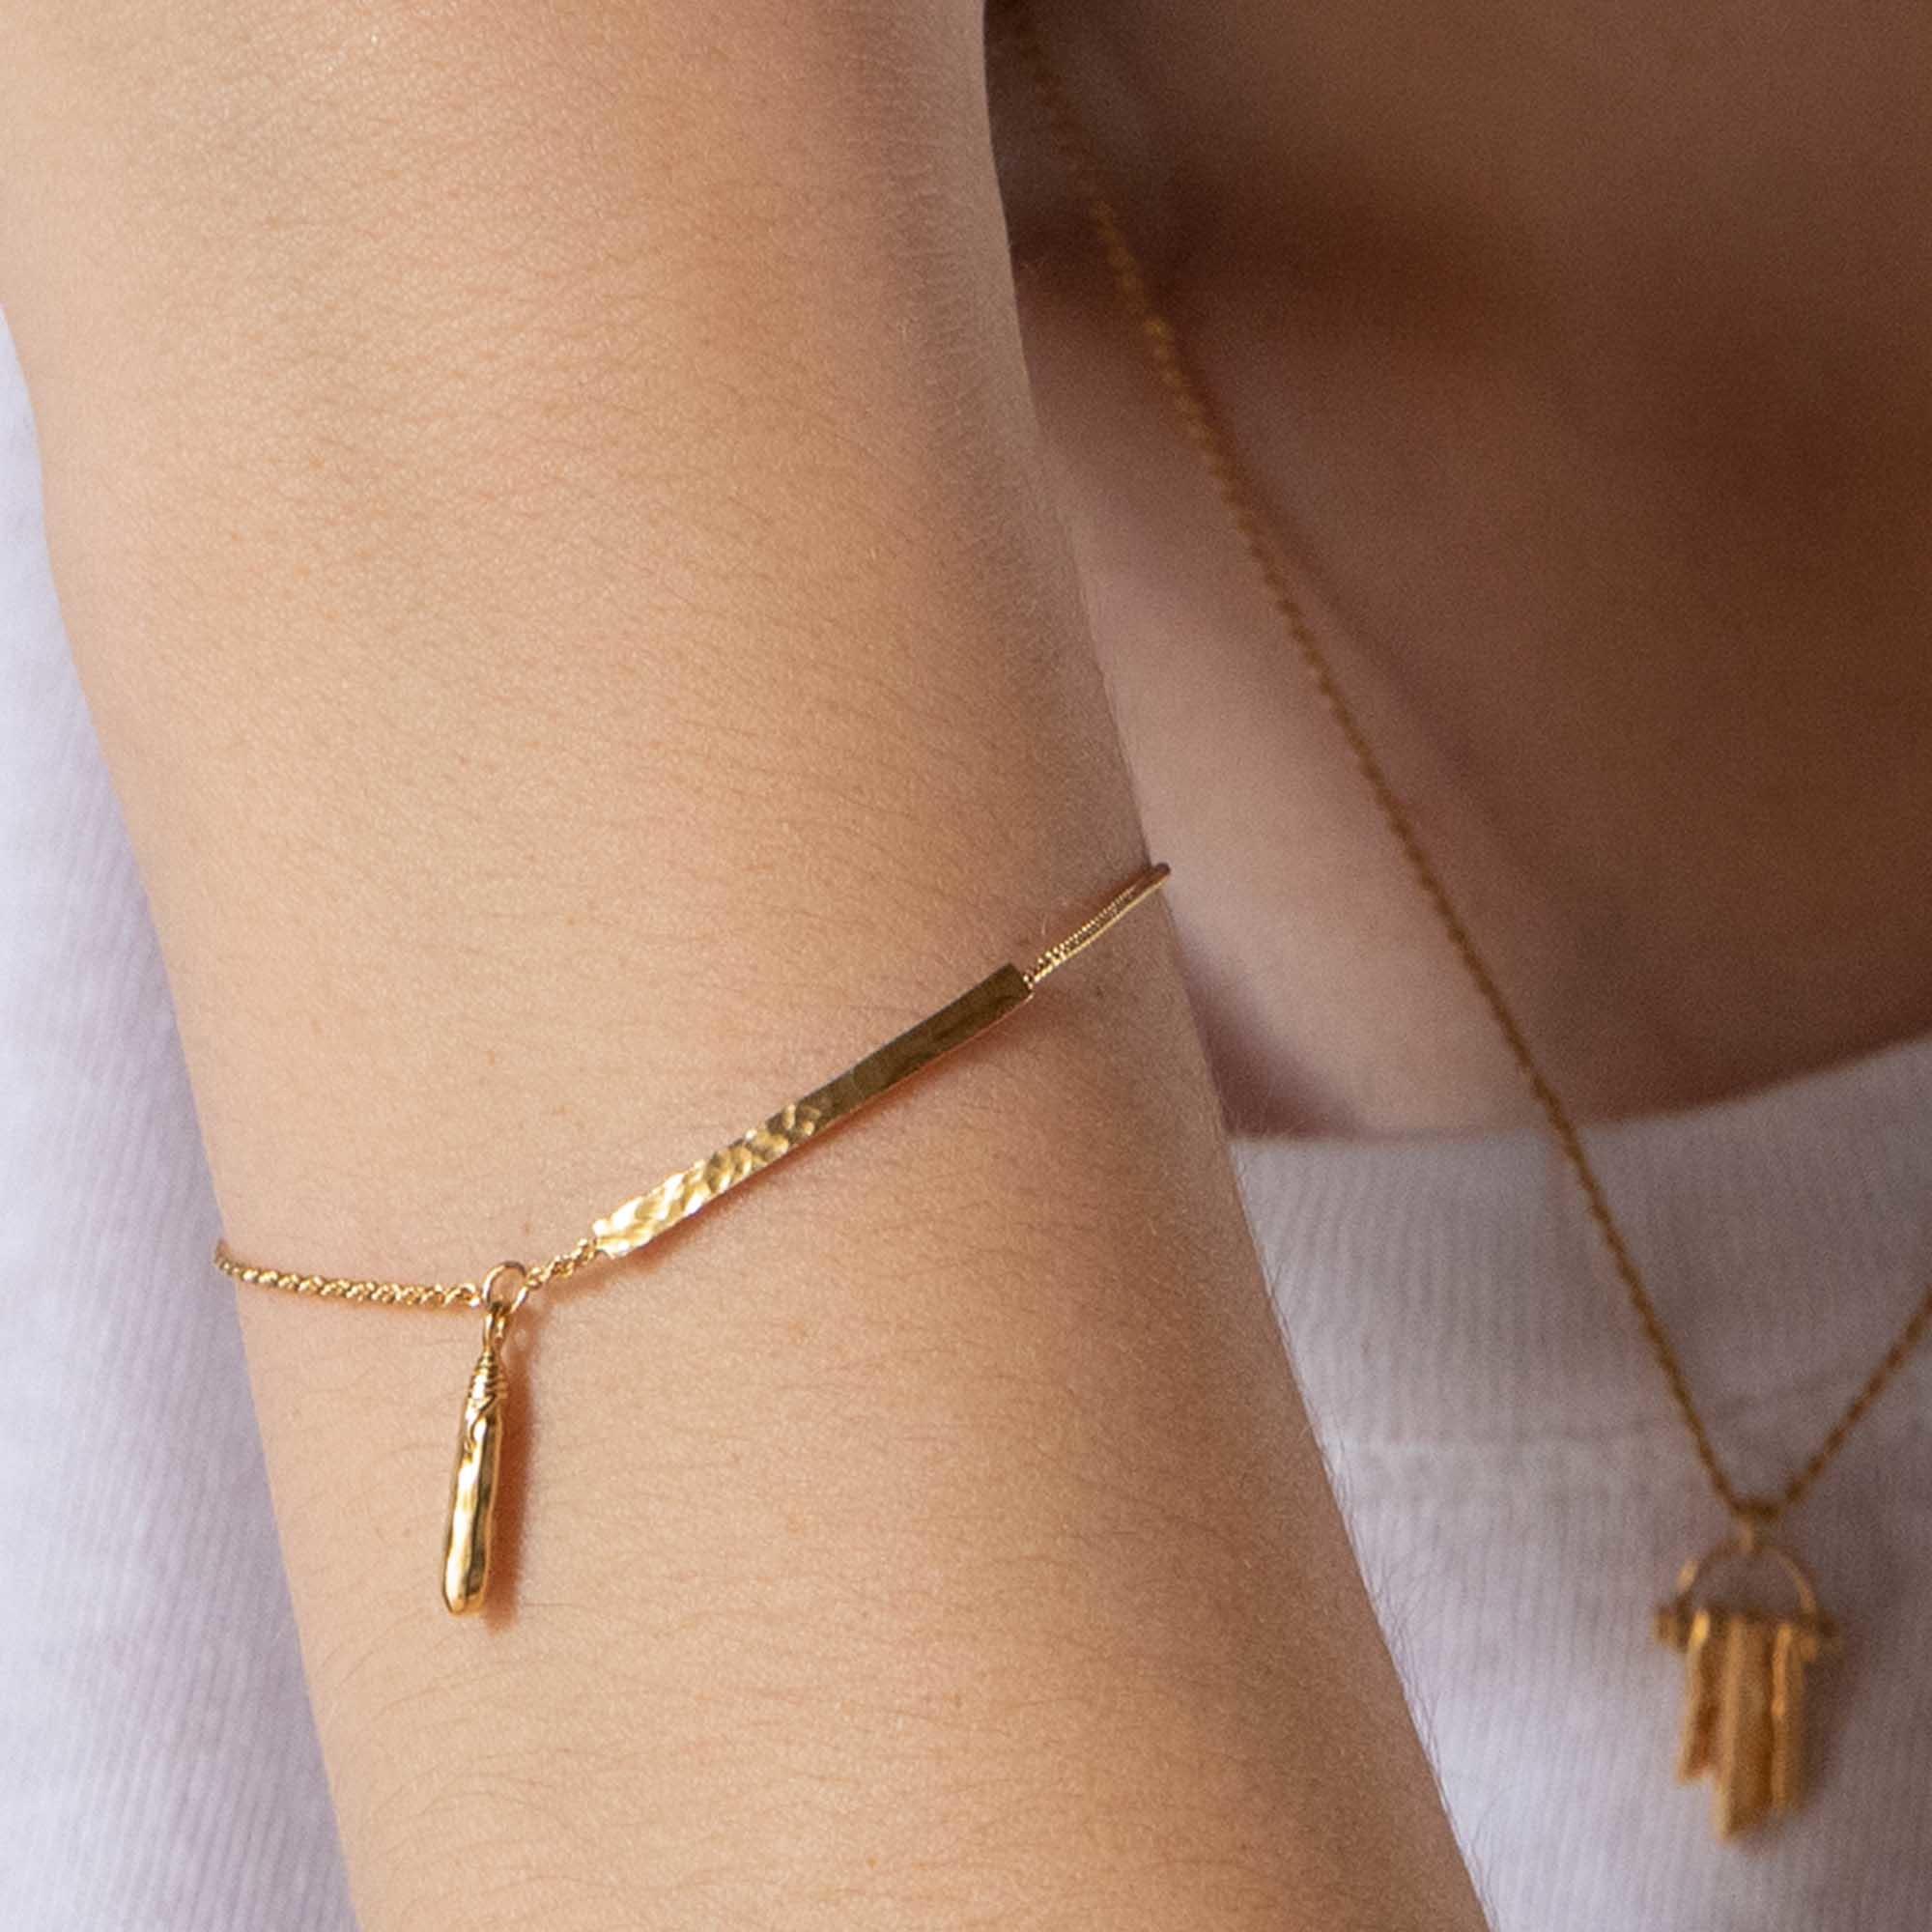 Violet Hamden Sisterhood Phoebe 925 sterling silver guldfärgad armband